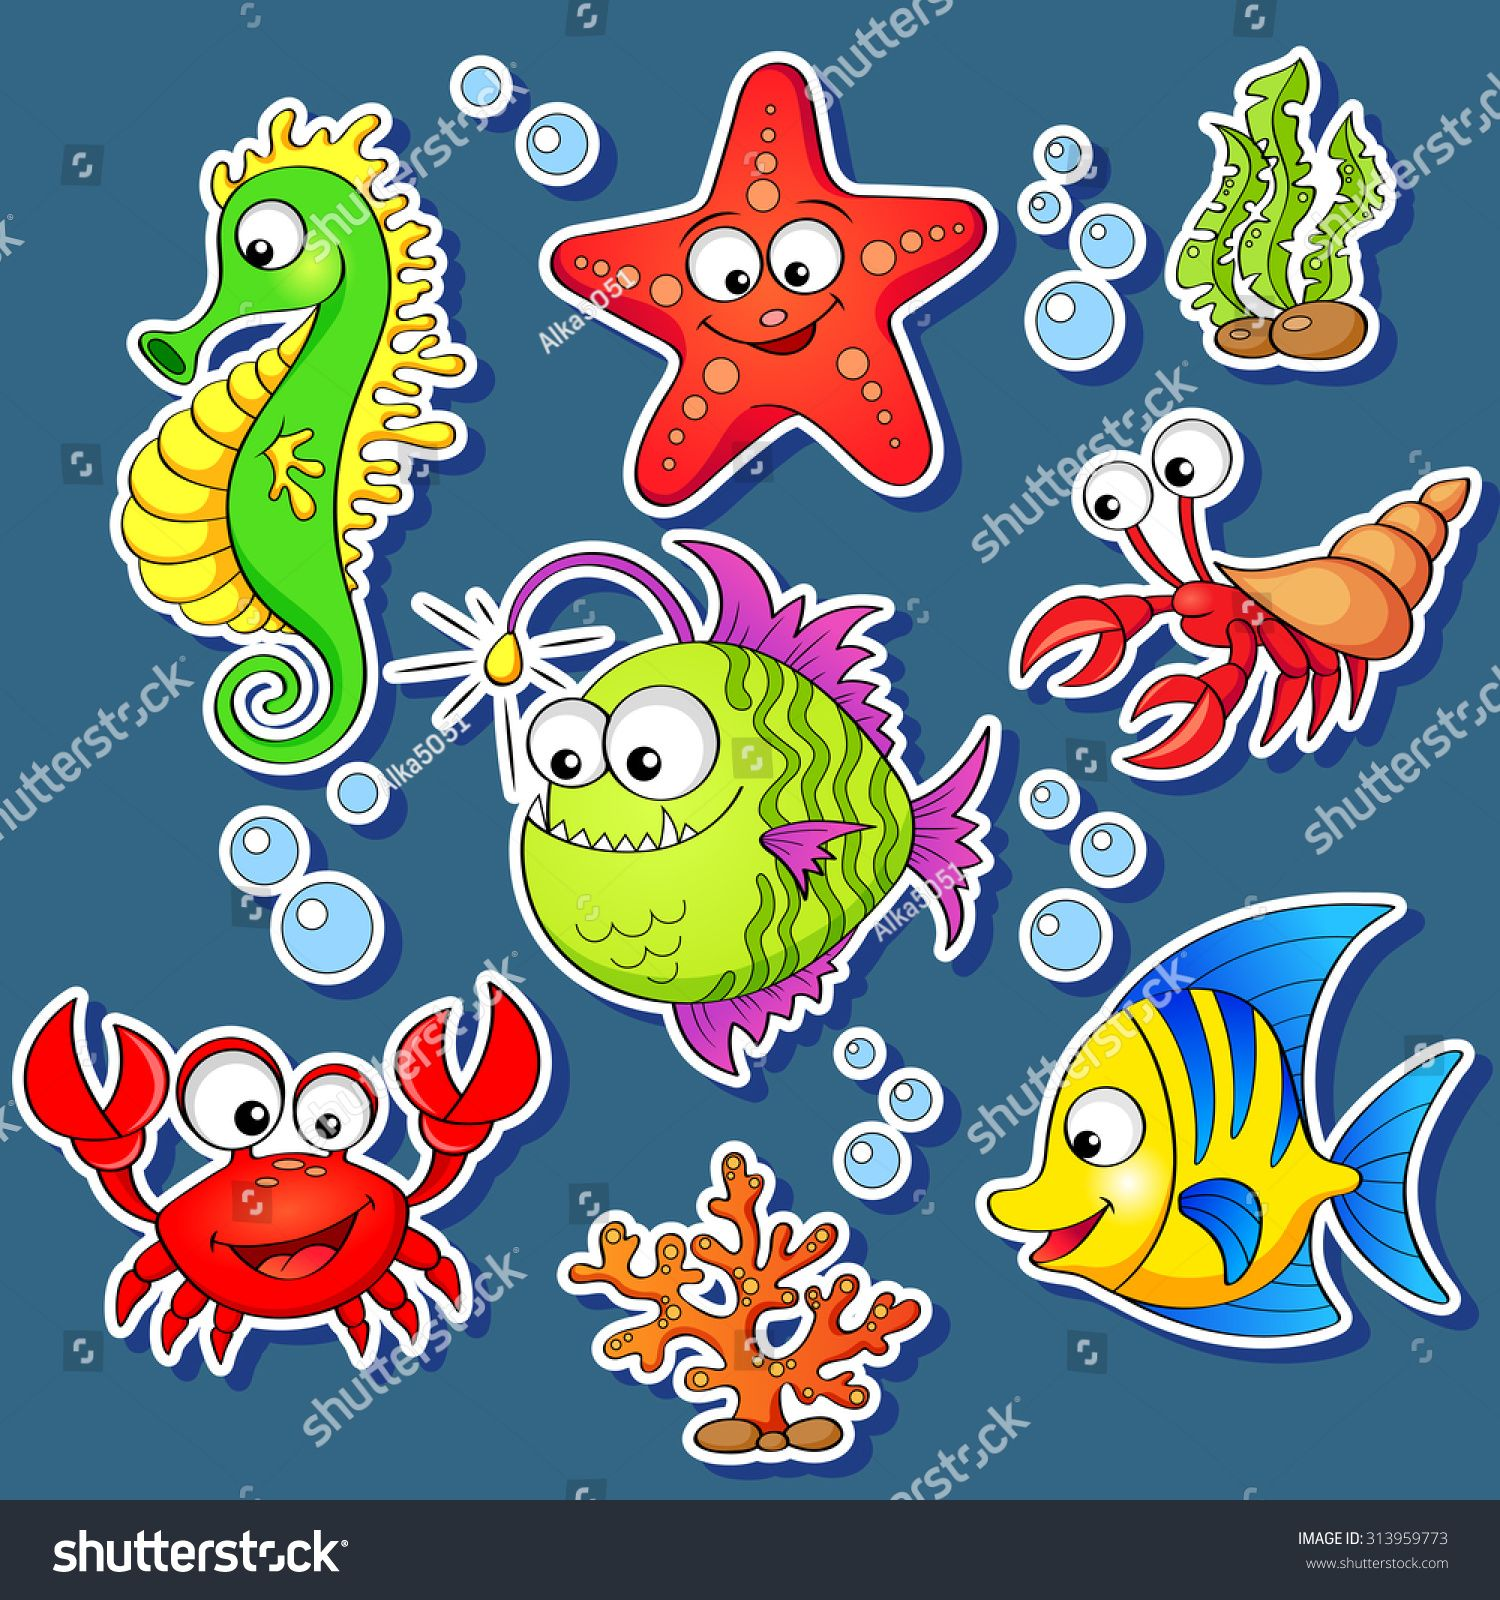 Stickers Of Cute Cartoon Sea Animals Cartoon Sea Animals Sea Animals Drawings Sea Animals